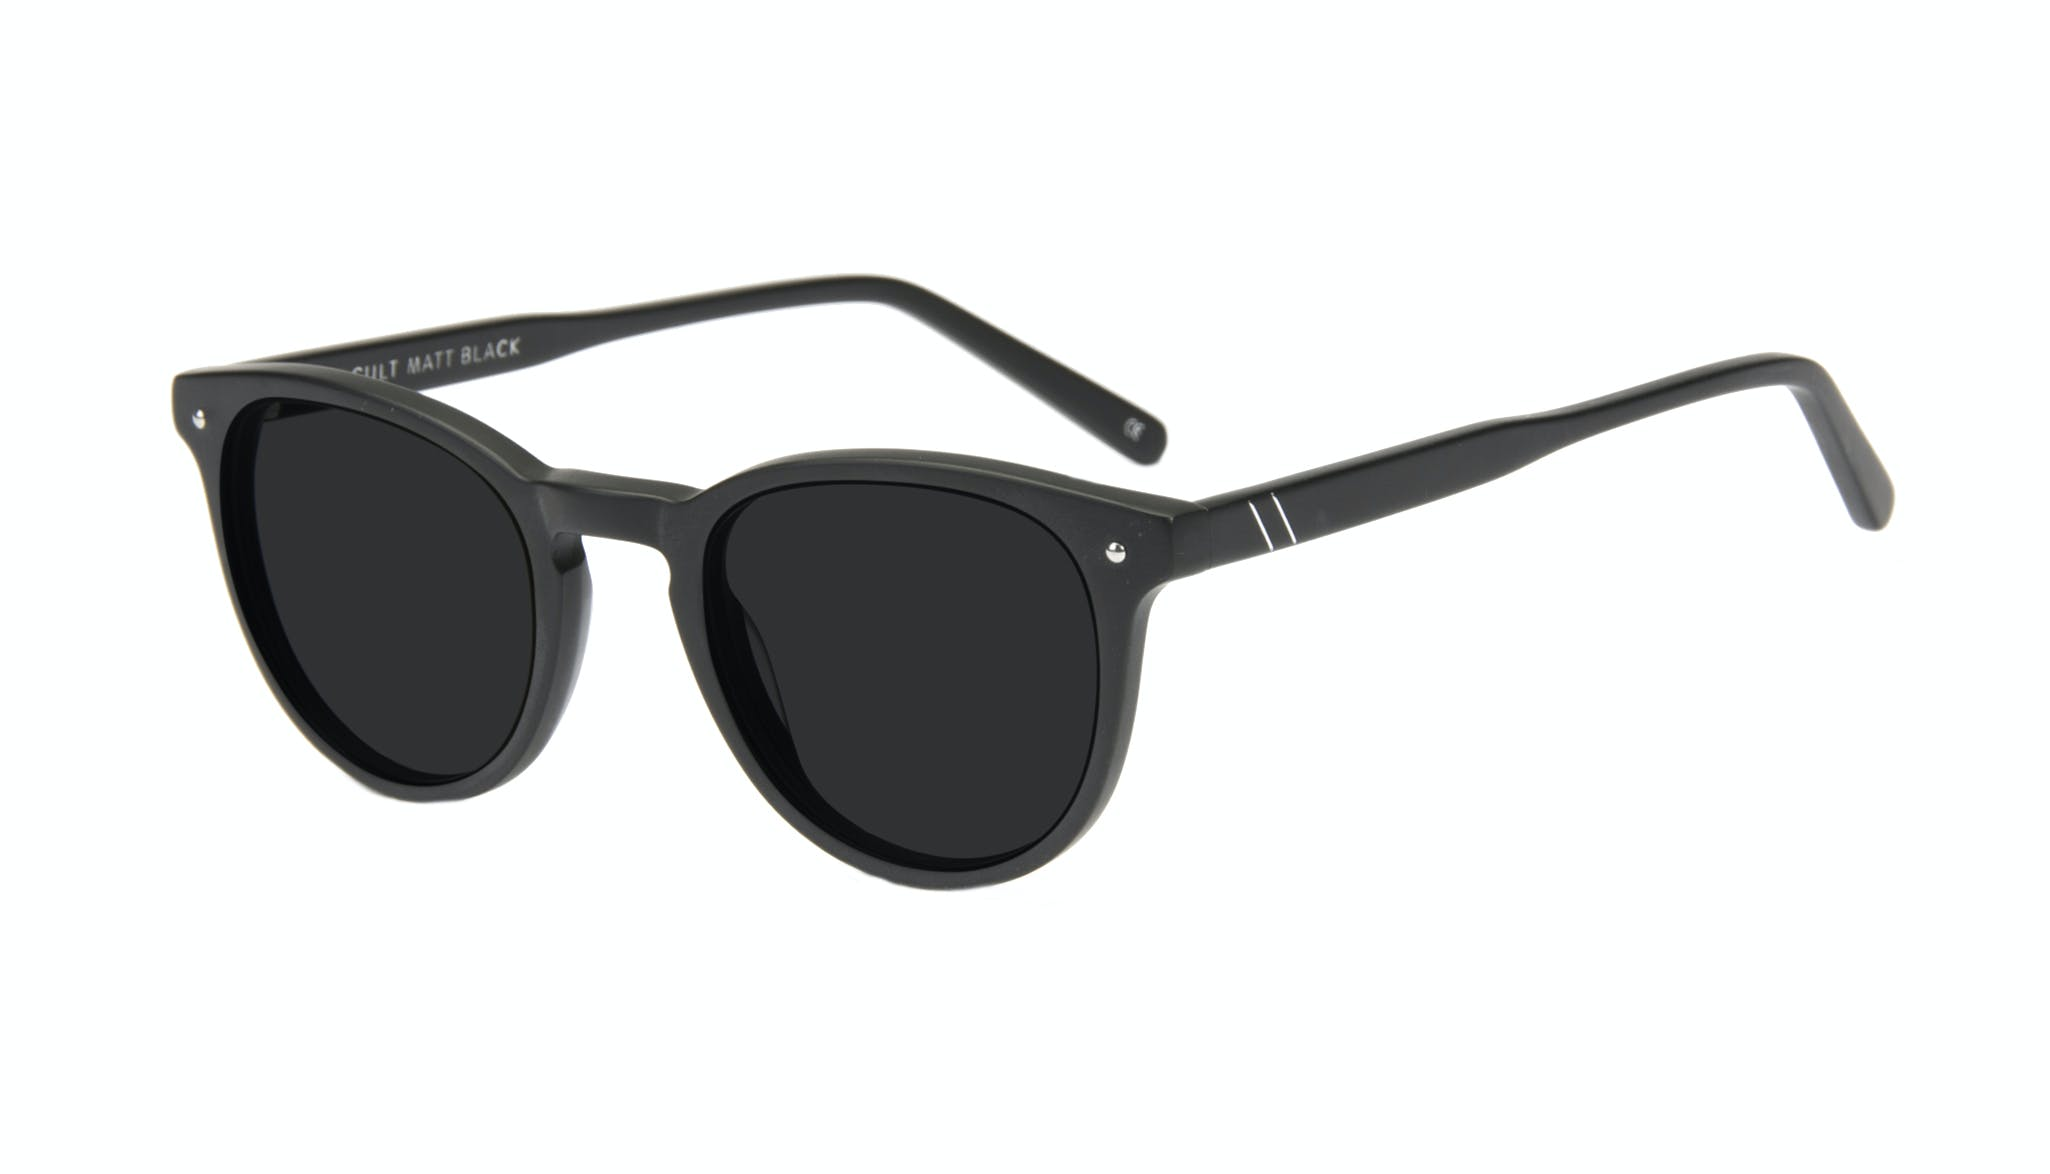 Affordable Fashion Glasses Round Sunglasses Men Cult Matt Black Tilt